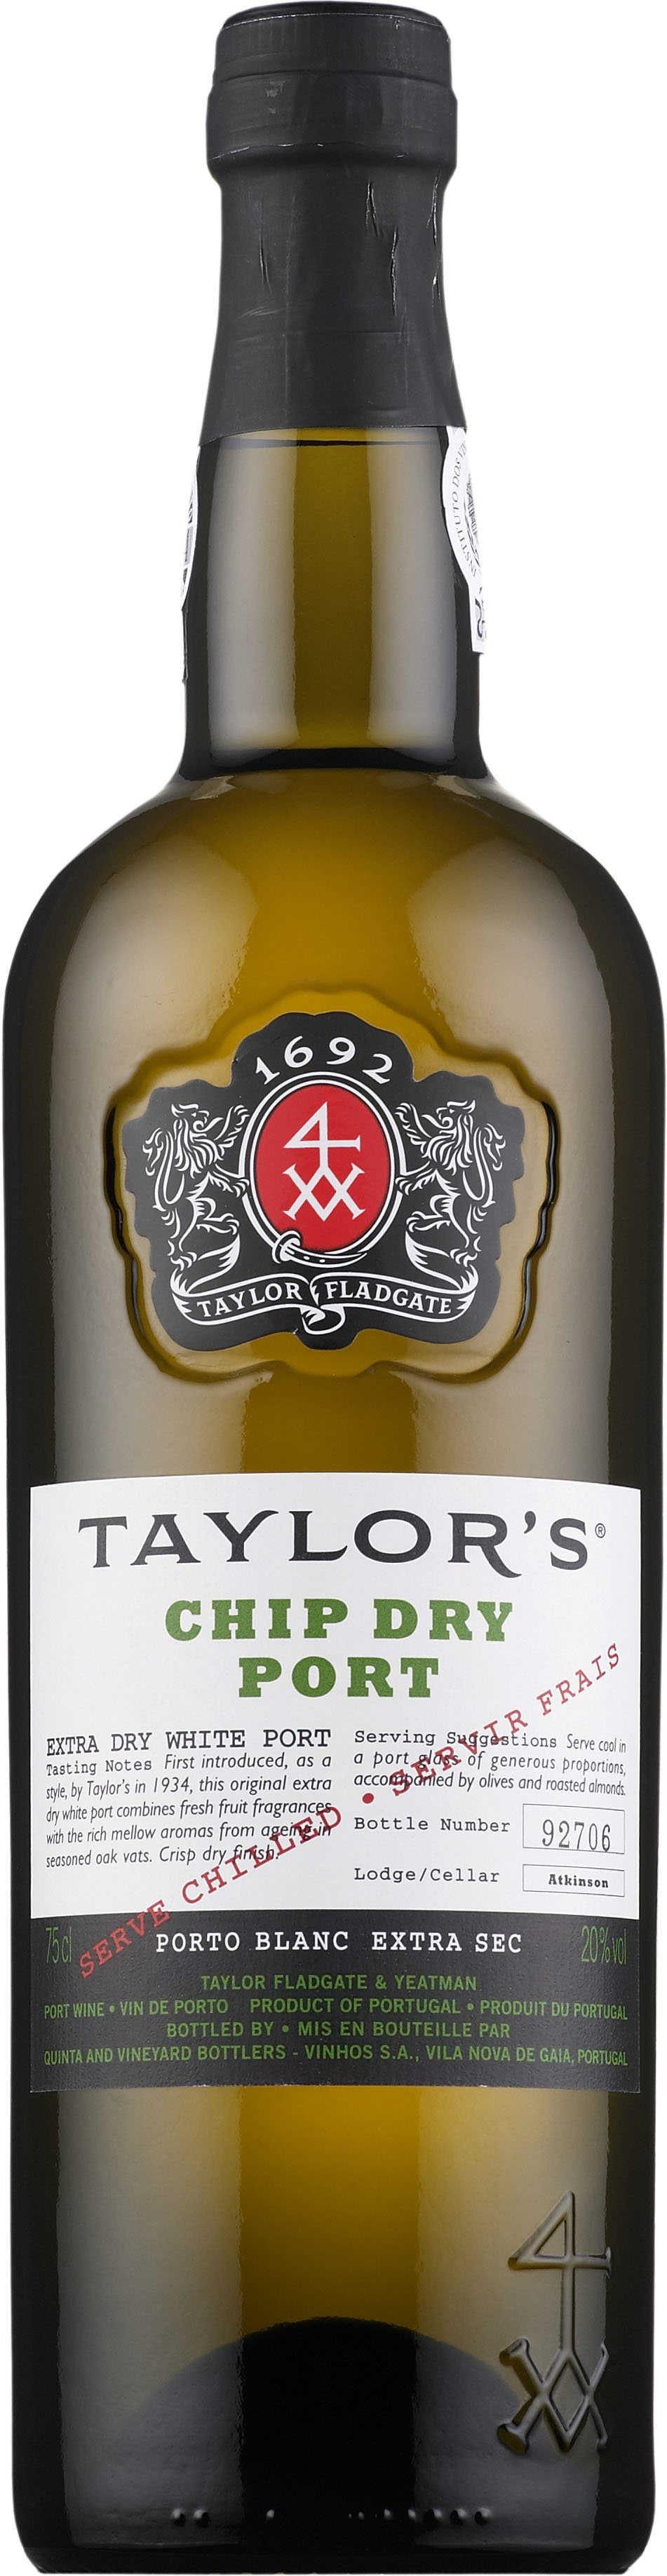 taylors-chip-dry-port